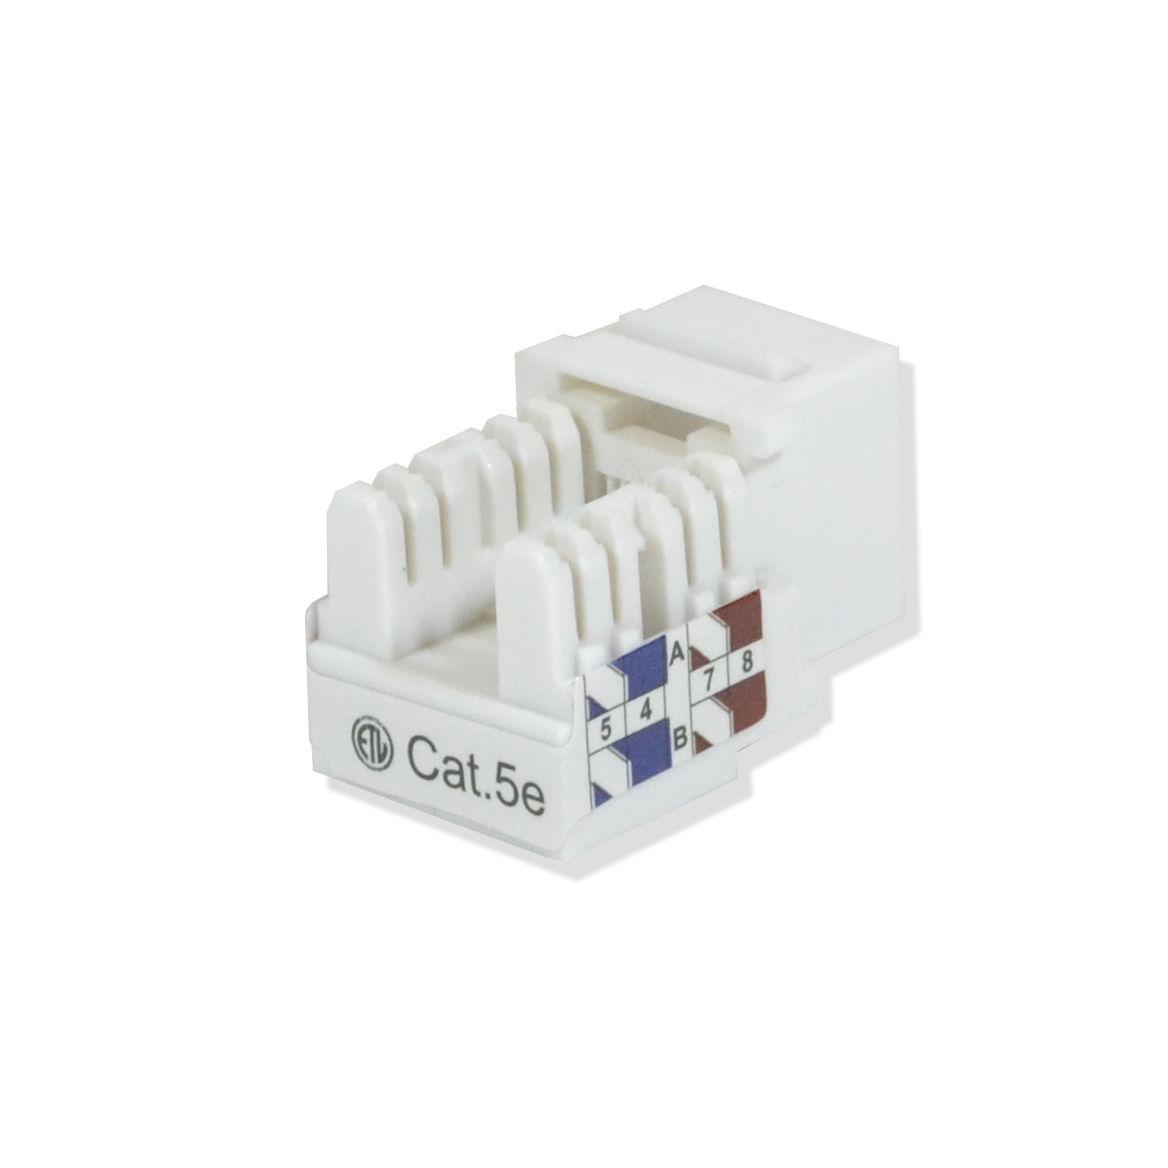 Cat5e Keystone Jack 110 Punch Down Network Ethernet Rj45